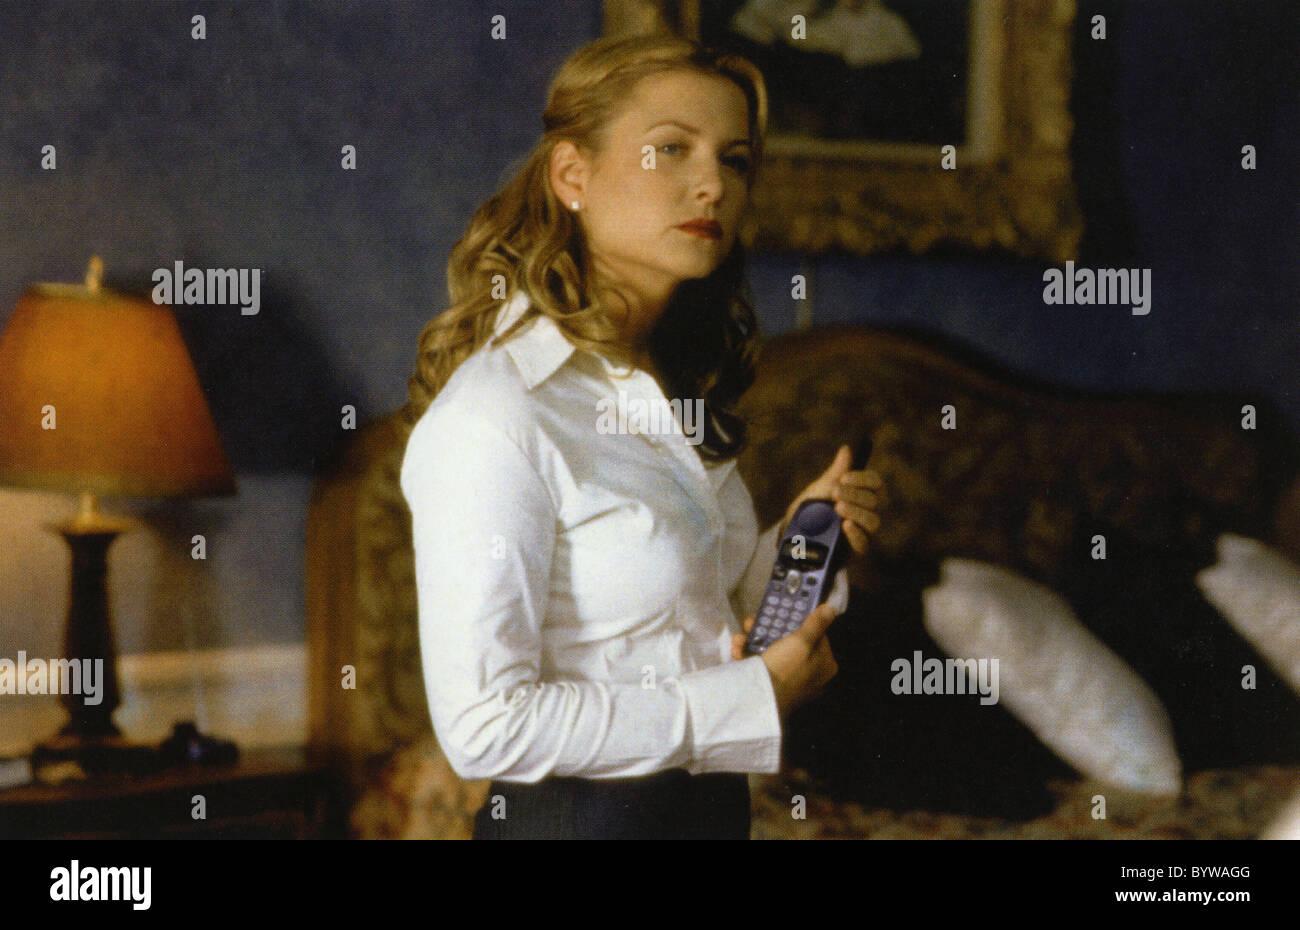 VALENTINE 2001 Warner Bros film with Jessica Capshaw - Stock Image